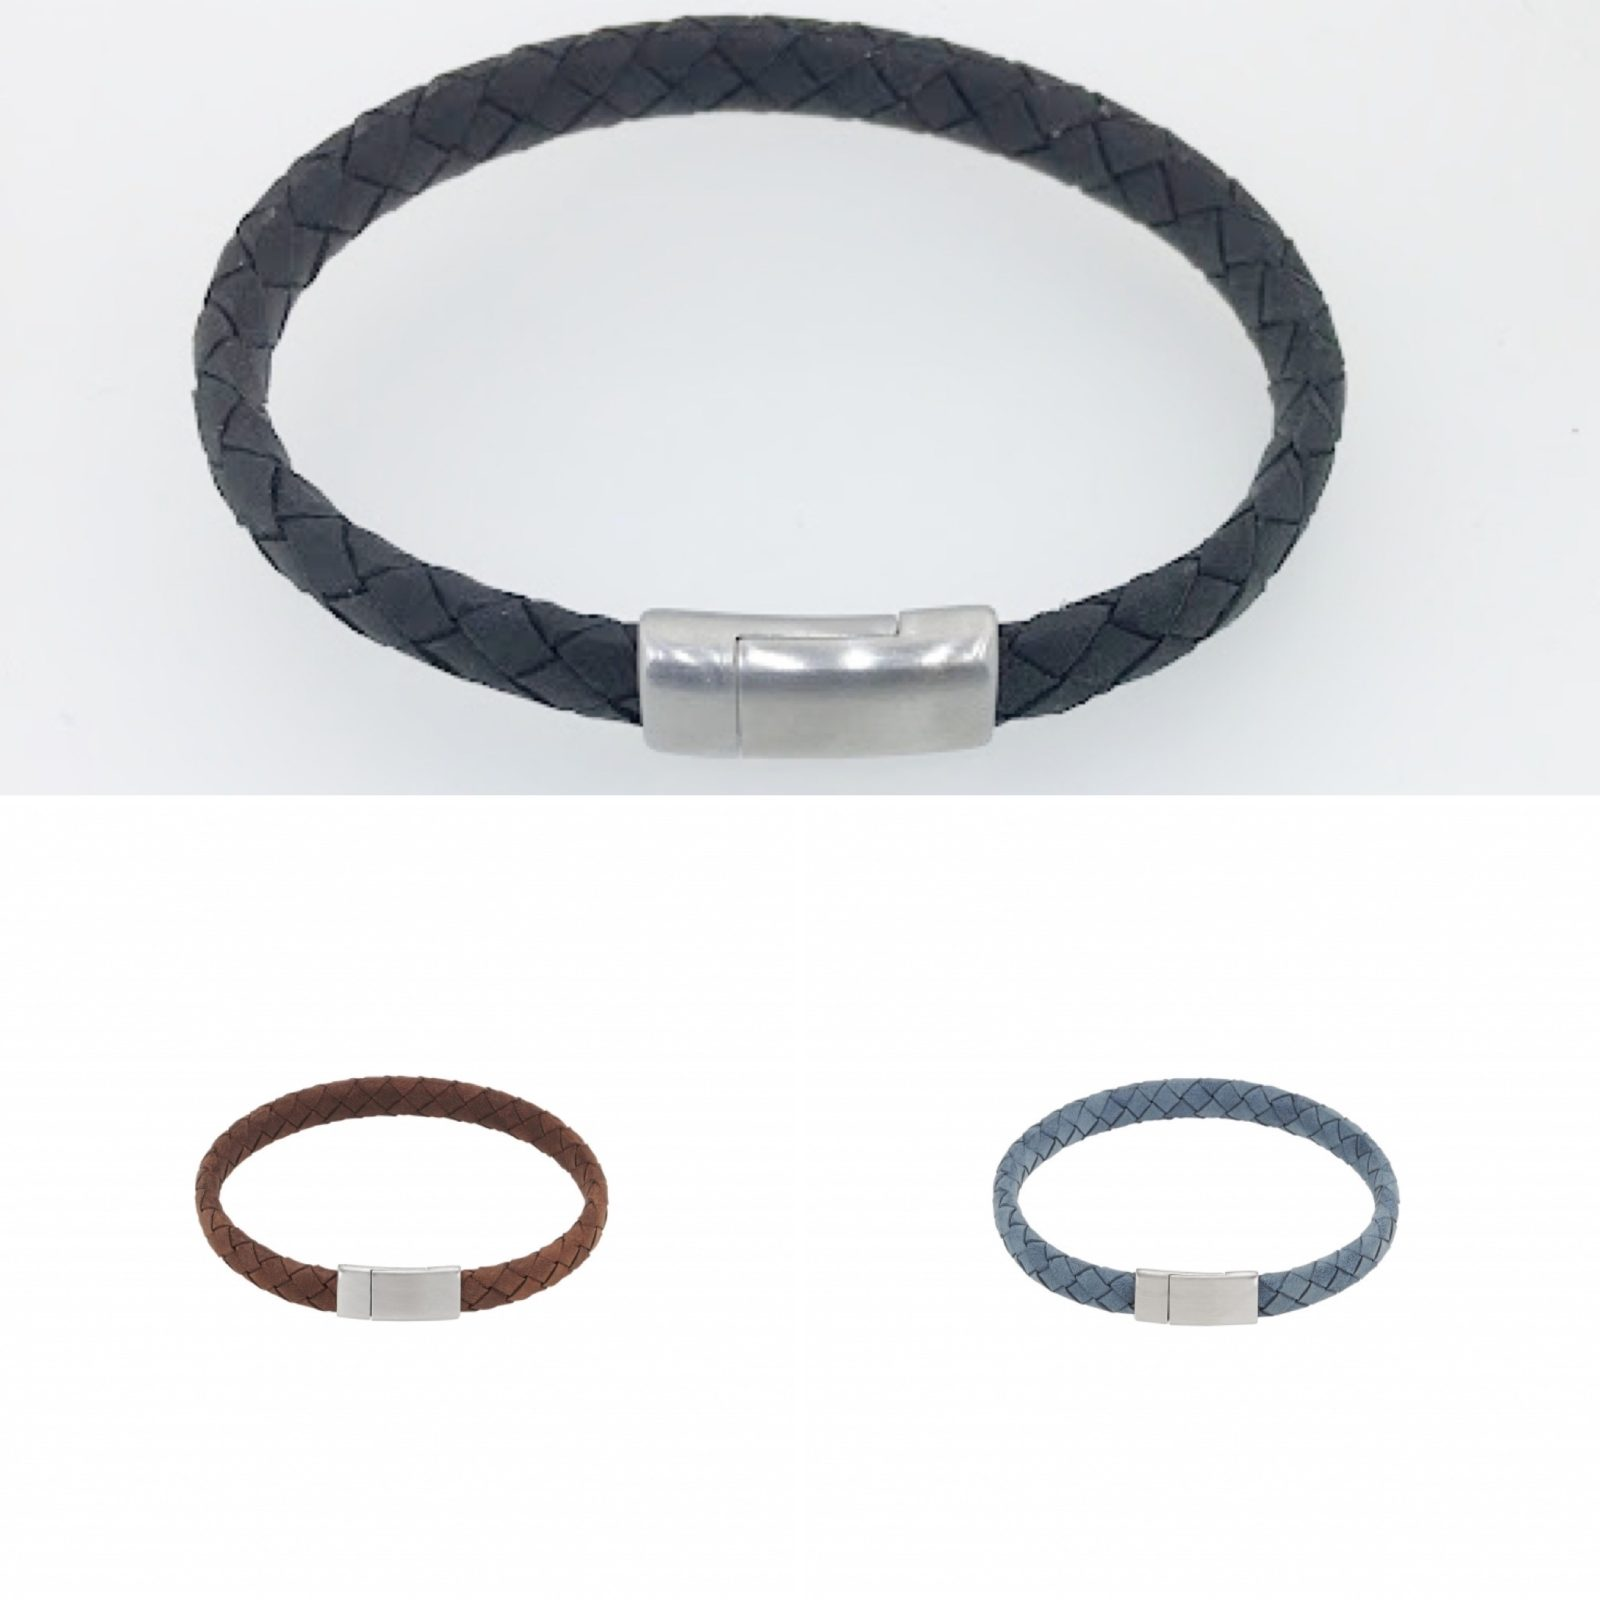 630-25 3 kleurstellingen armbanden iFmHeemstede